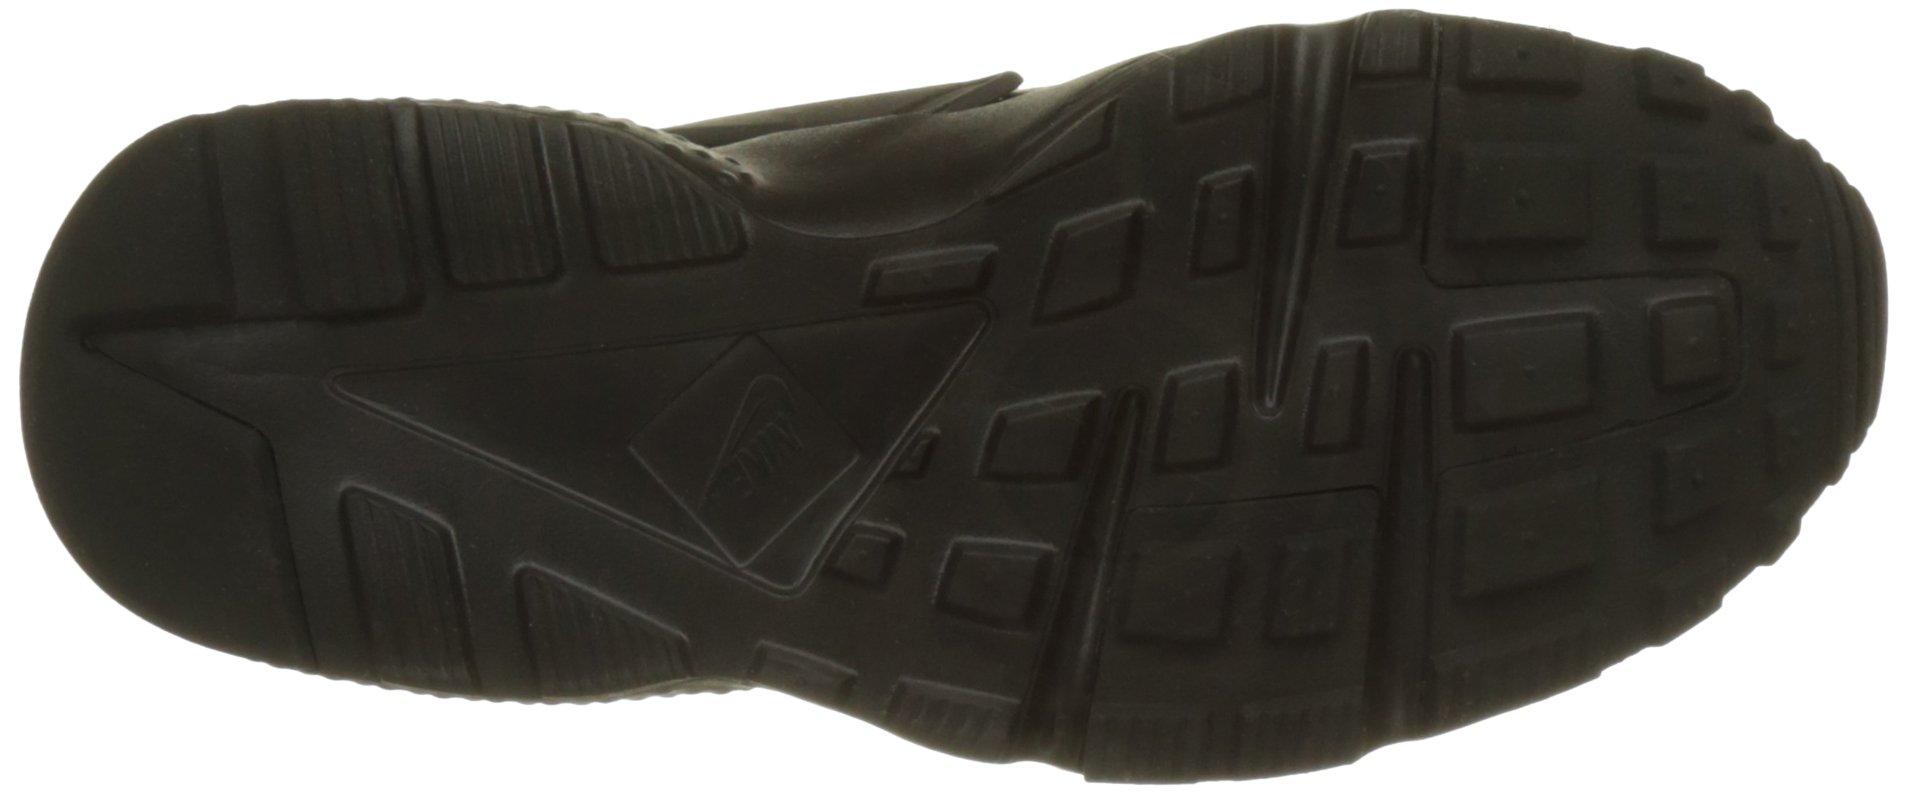 61HkBP U8yL - Nike Huarache Run (GS), Boys' Running Shoes